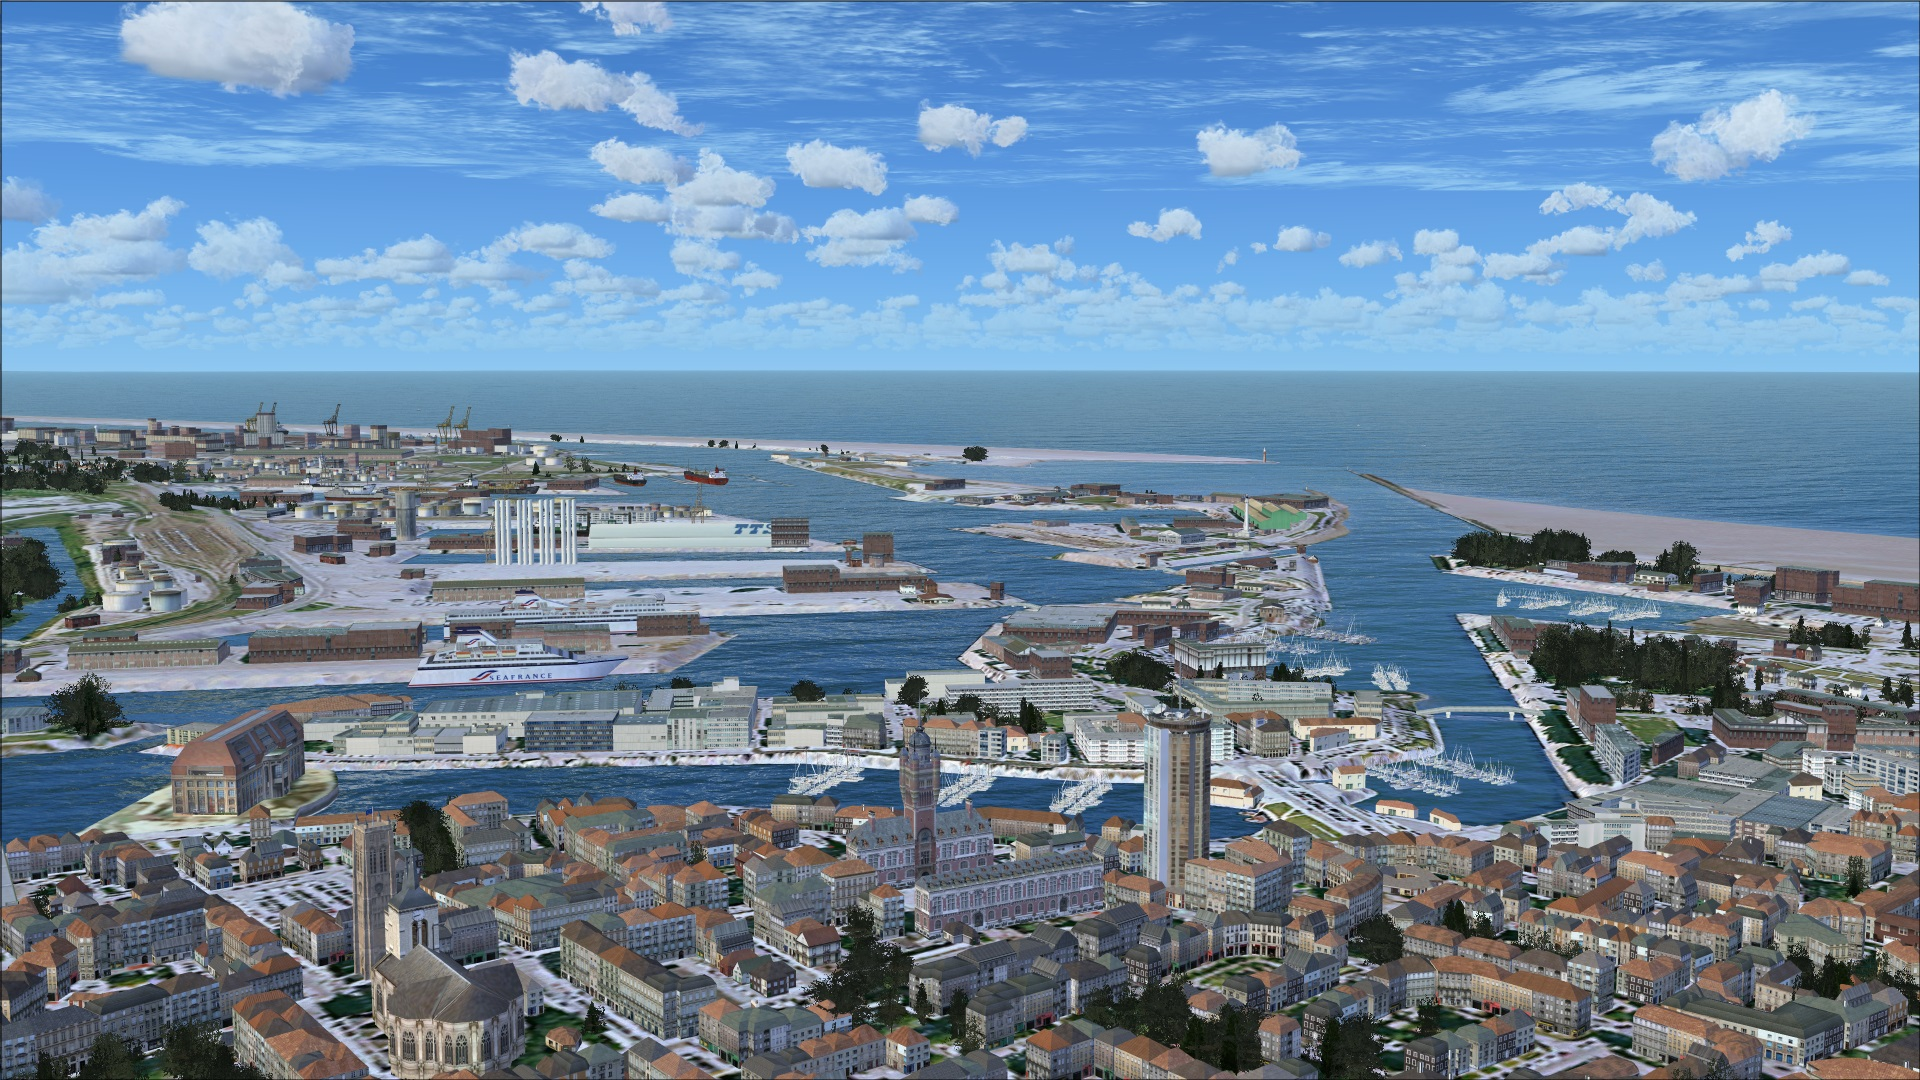 Review of francevfr nord pas de calais v2 for fsx nord pas de calais is the next release in - Dunkirk port france address ...